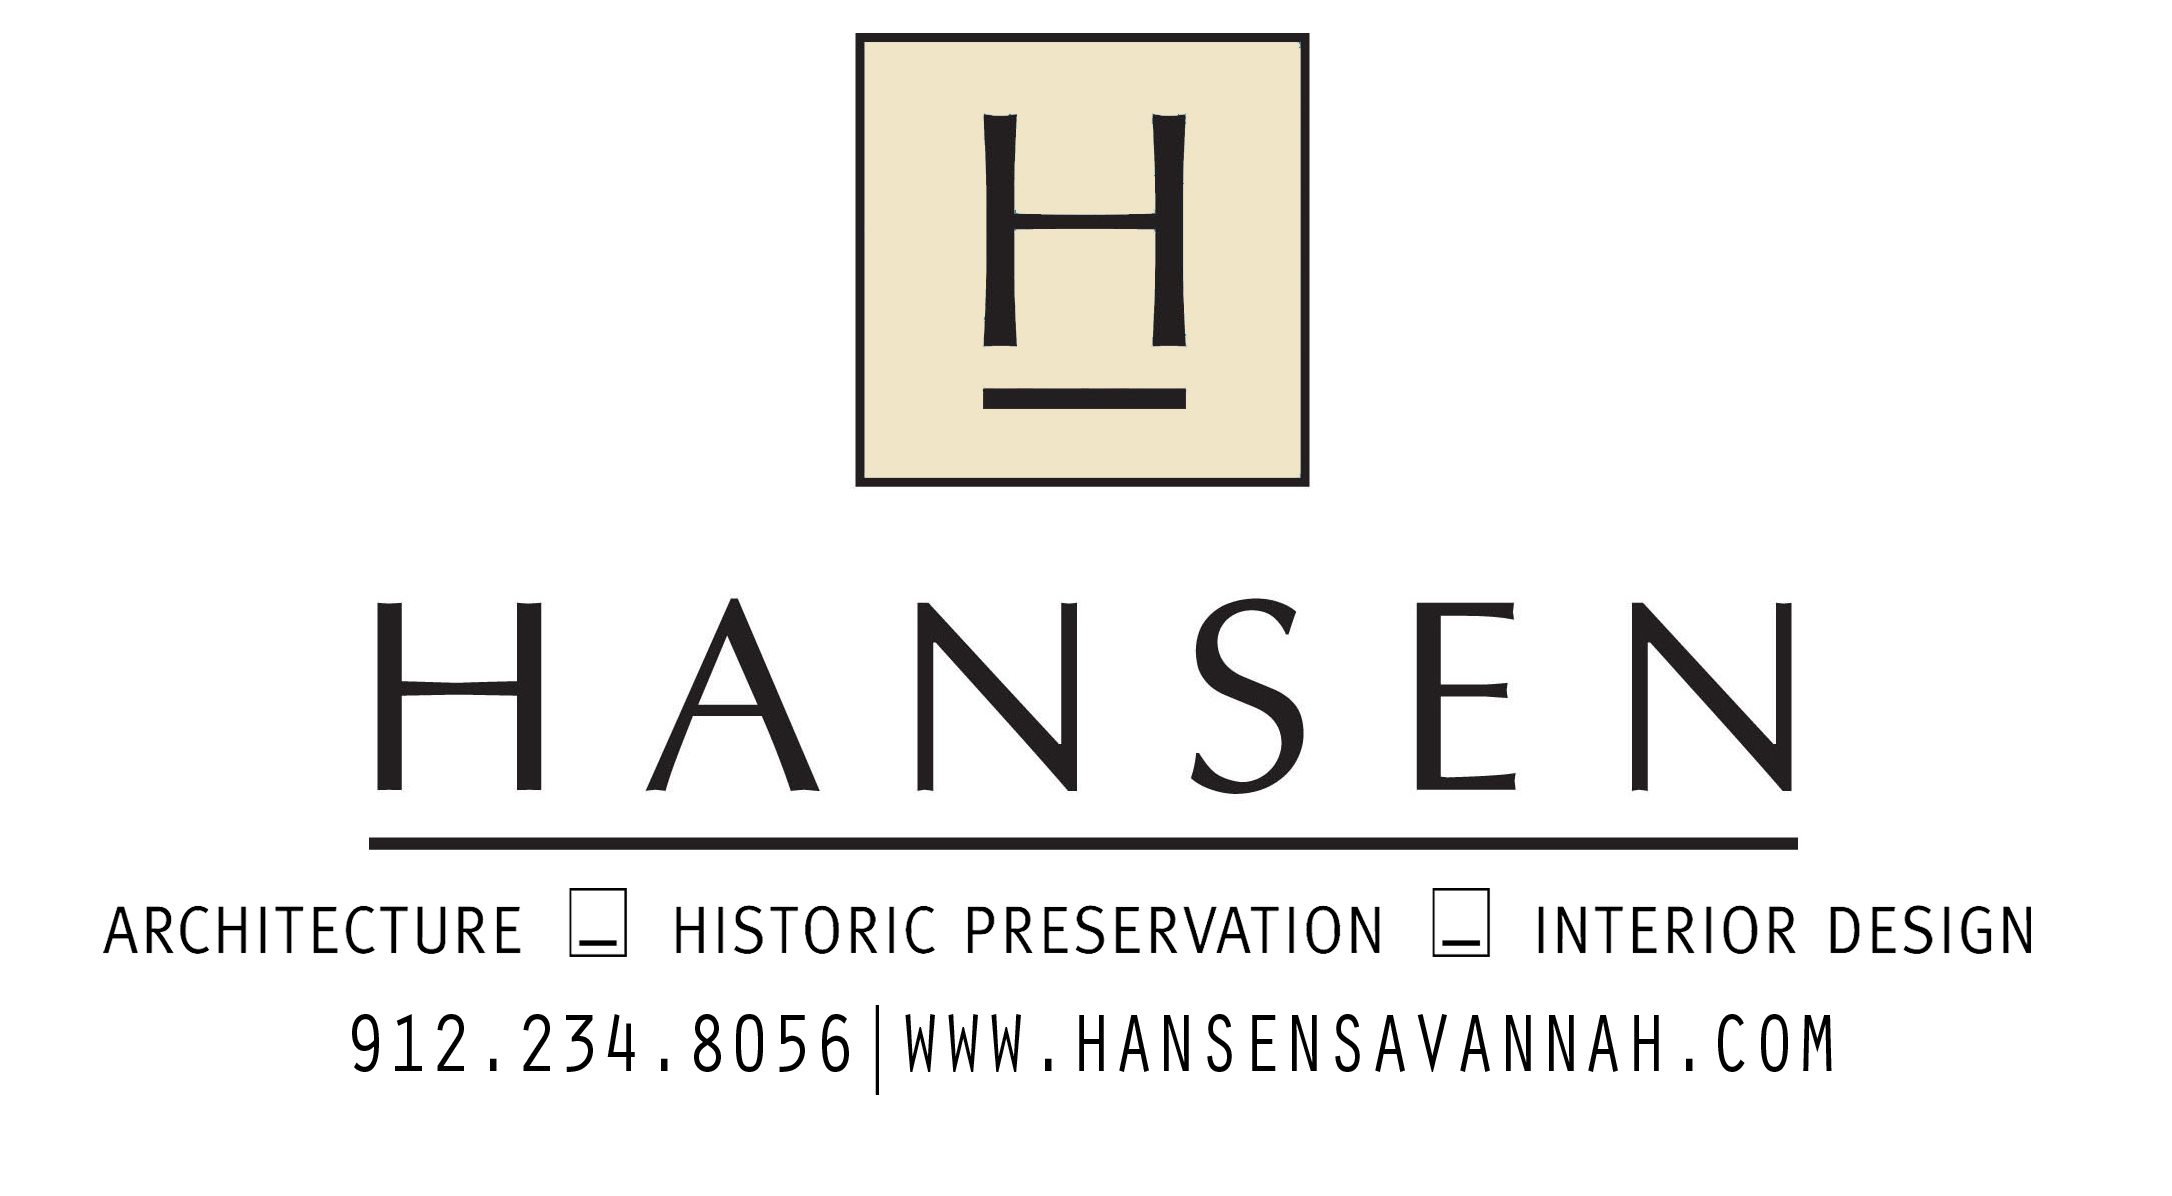 Hansen Architects